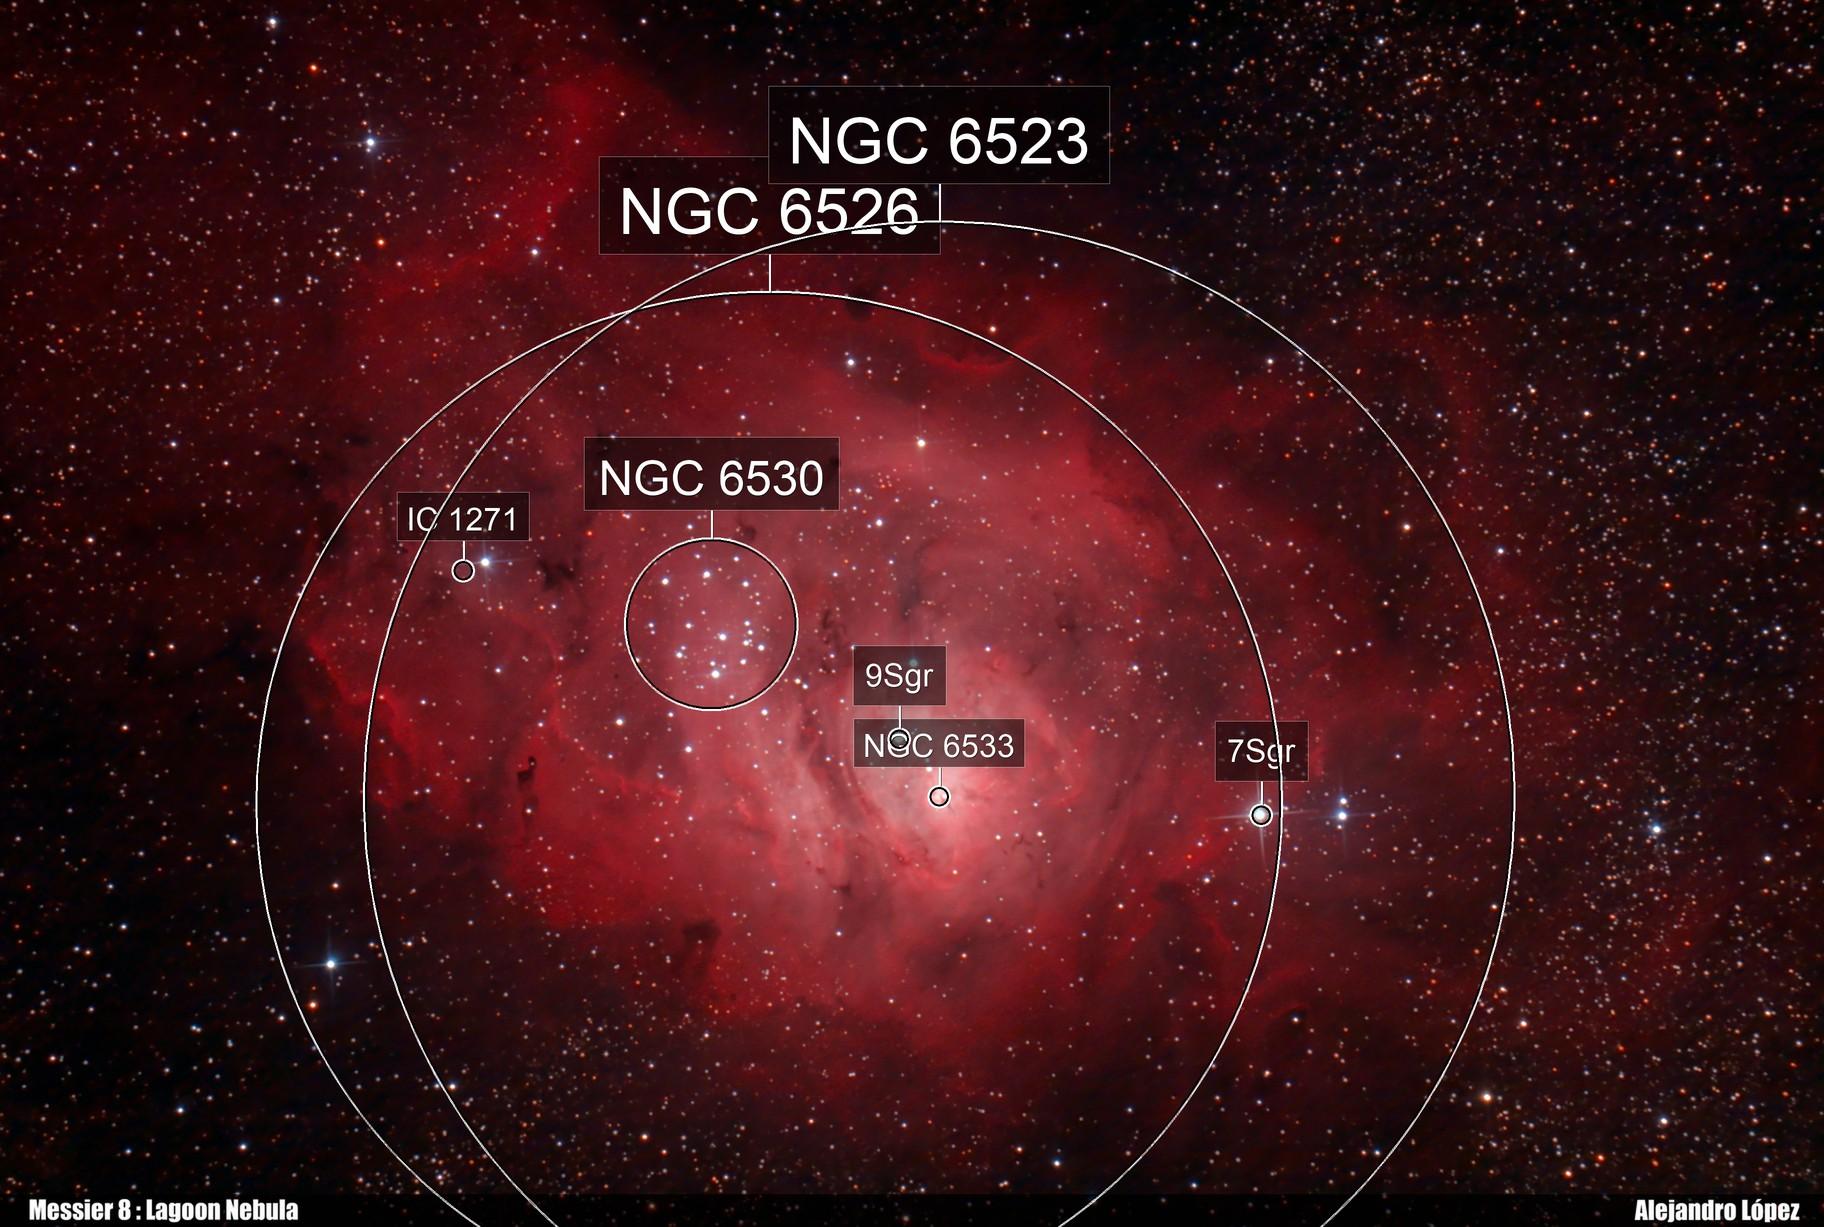 Messier 8. Lagoon Nebula